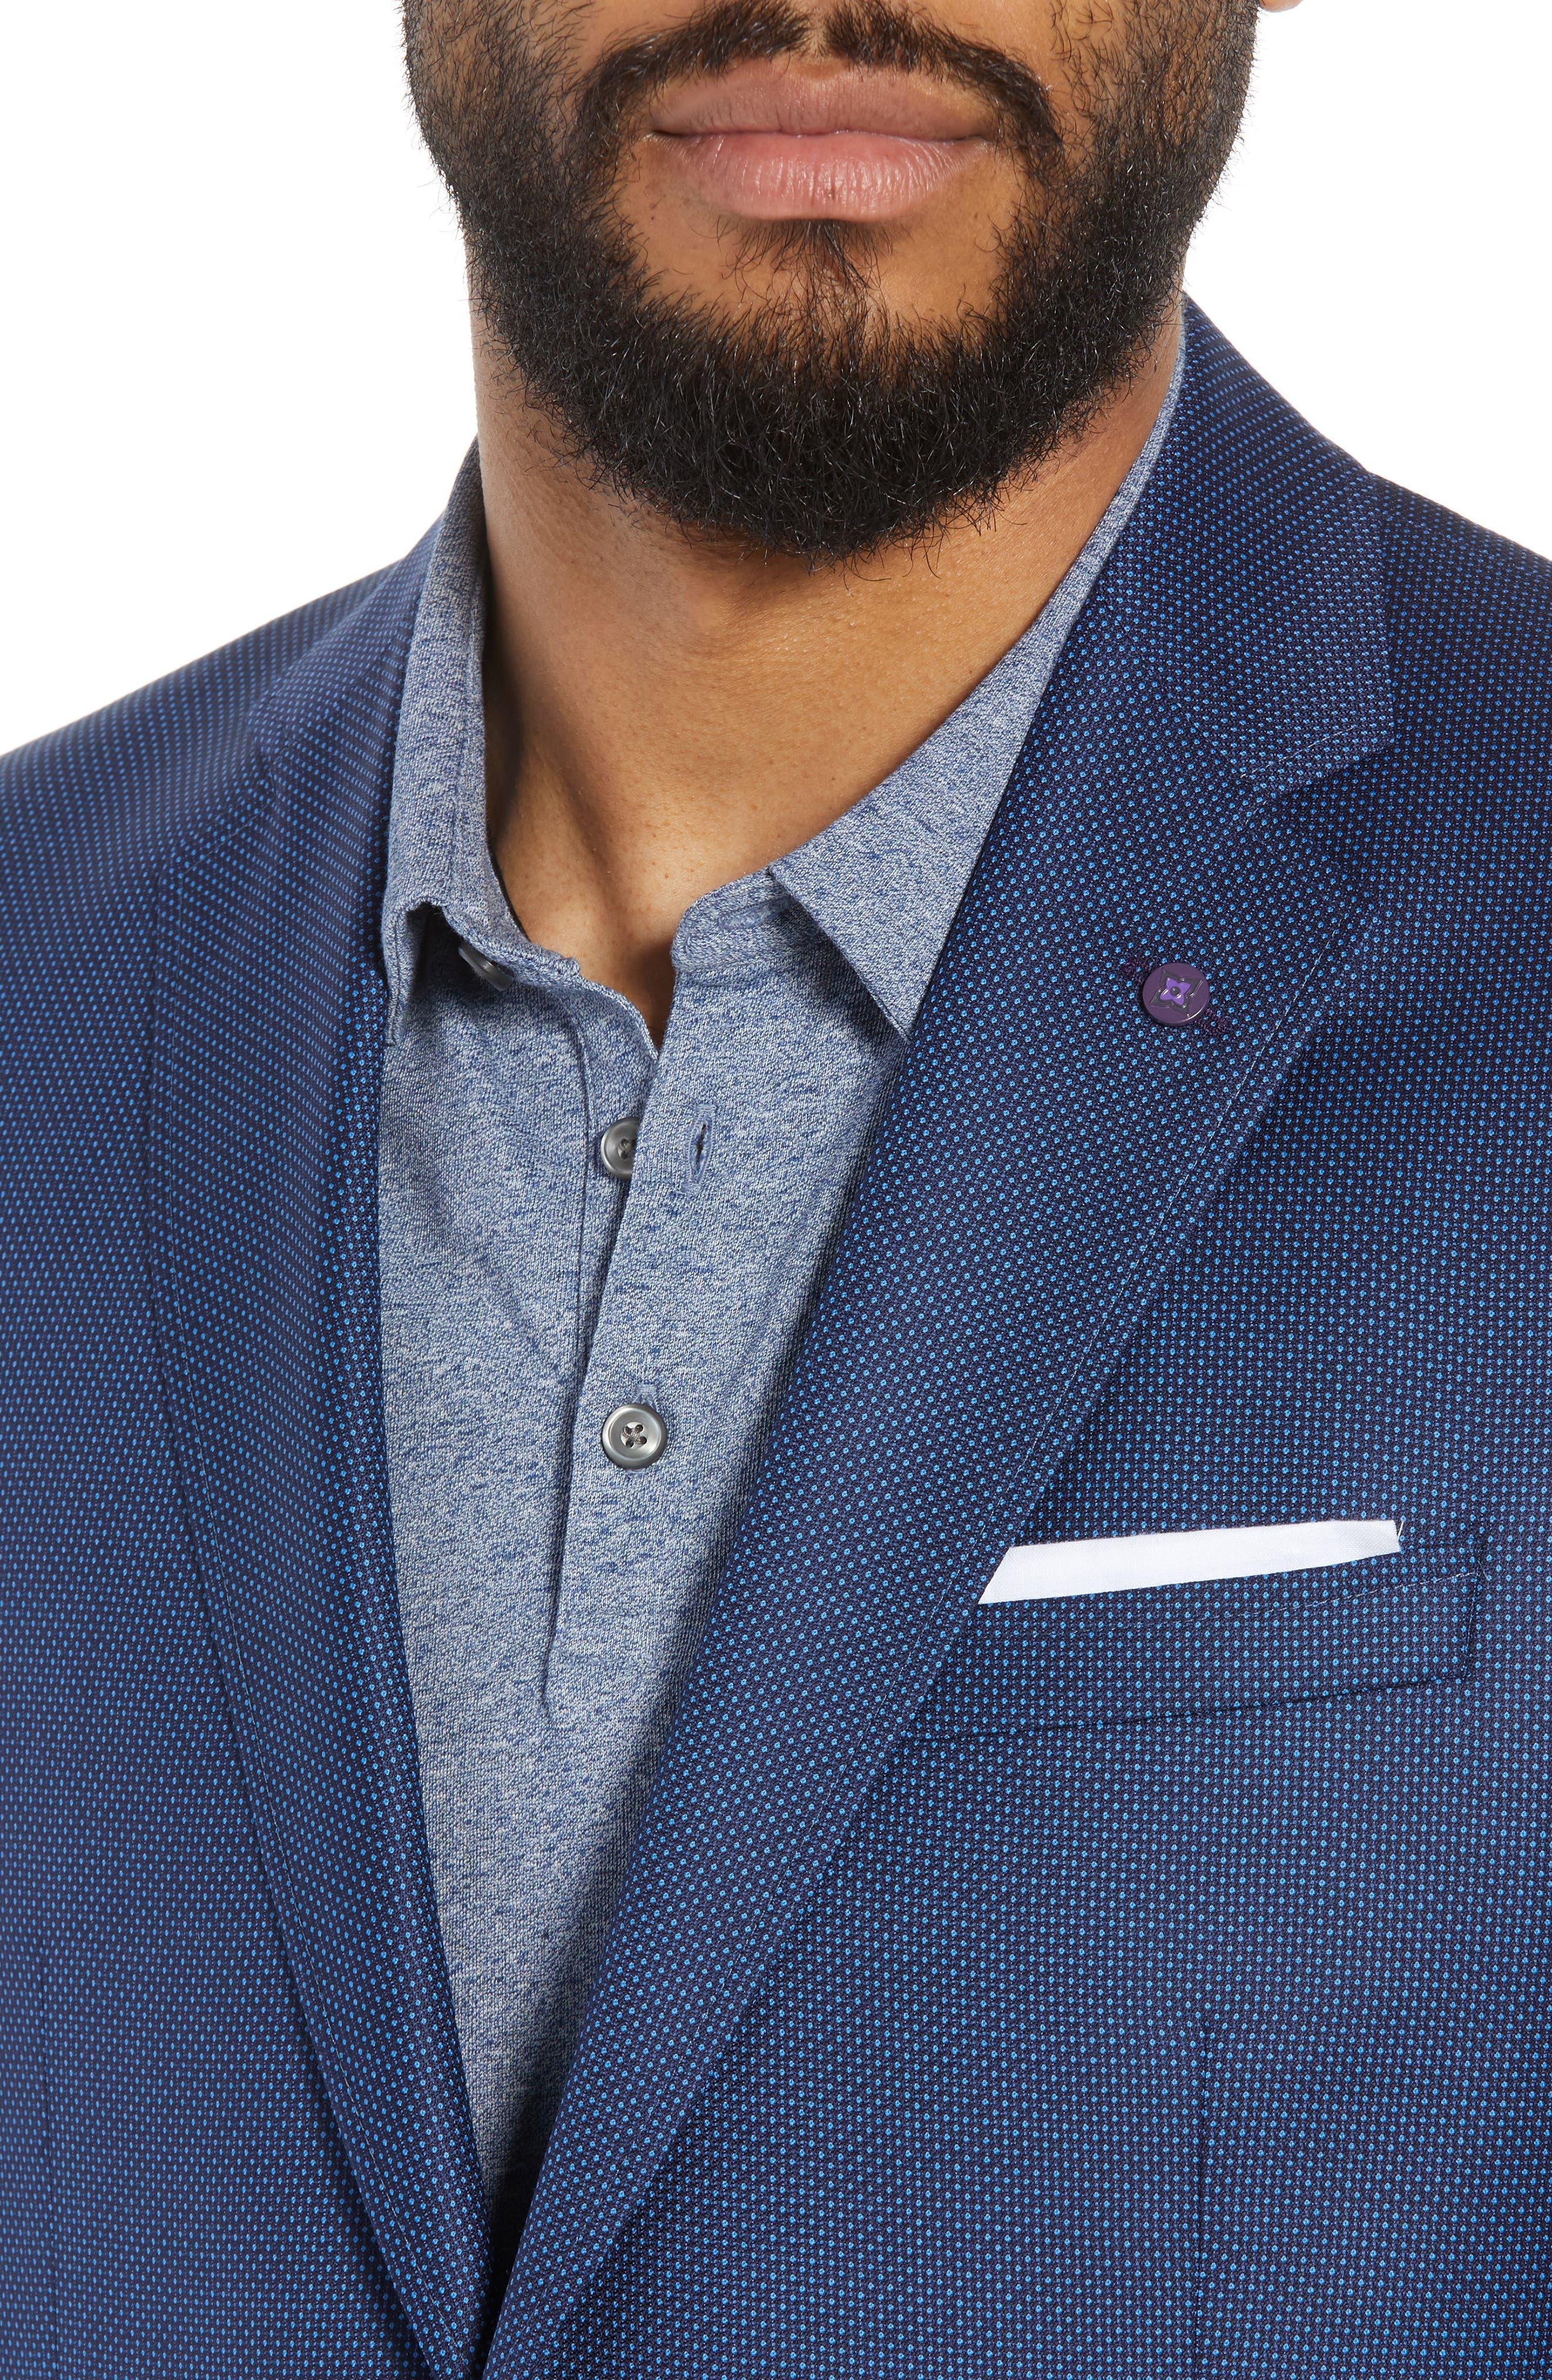 Jay Trim Fit Microdot Wool Sport Coat,                             Alternate thumbnail 4, color,                             400